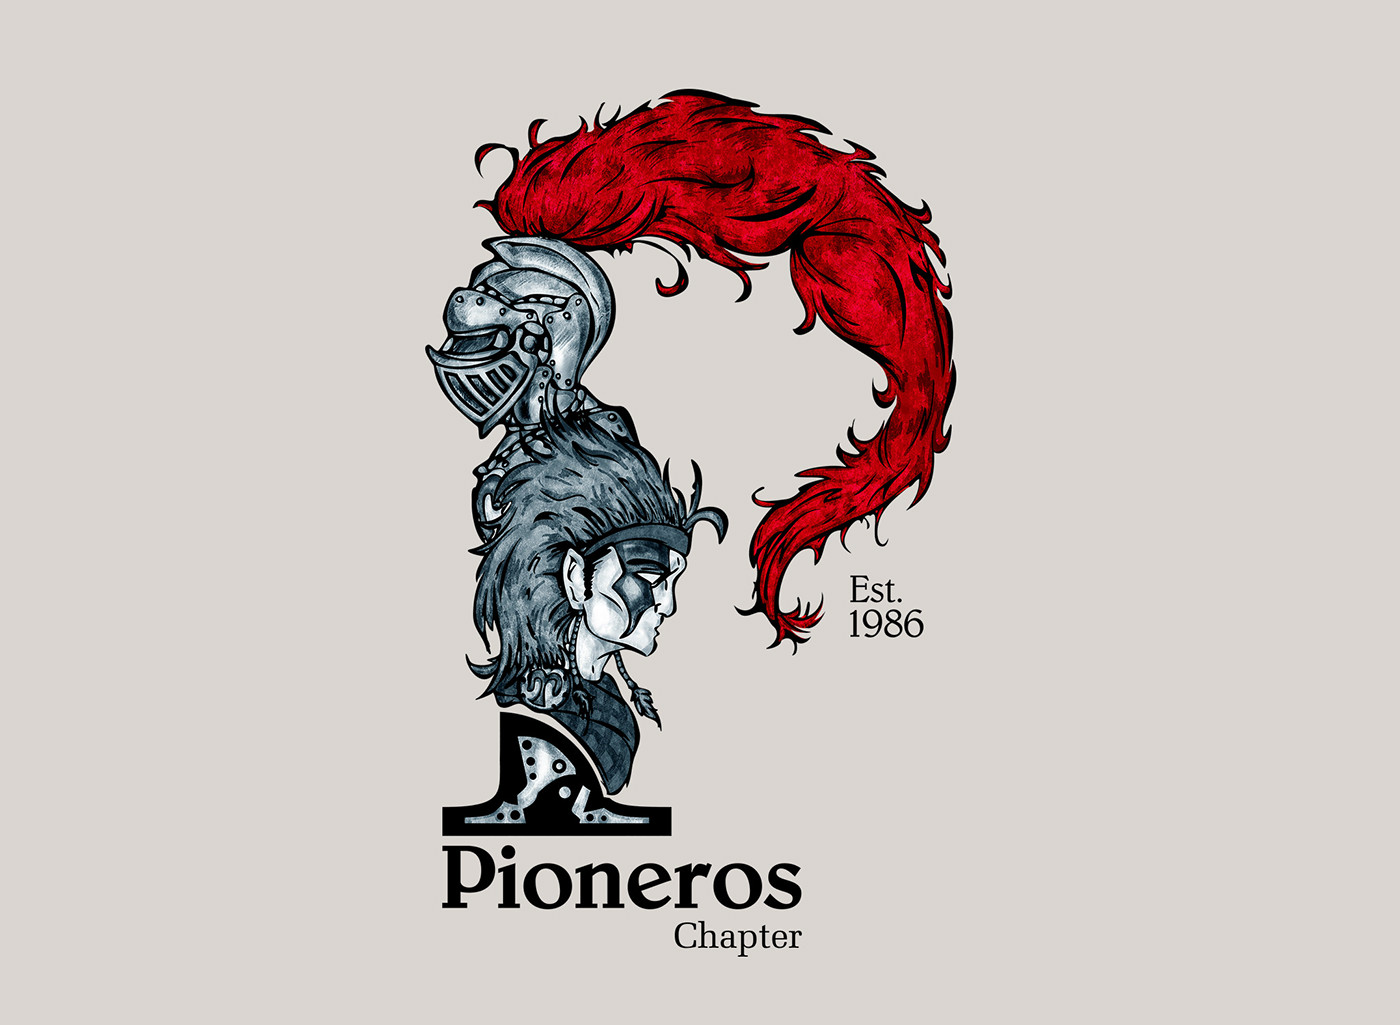 Pioneros t-shirt brand emblem iPad iphone logo